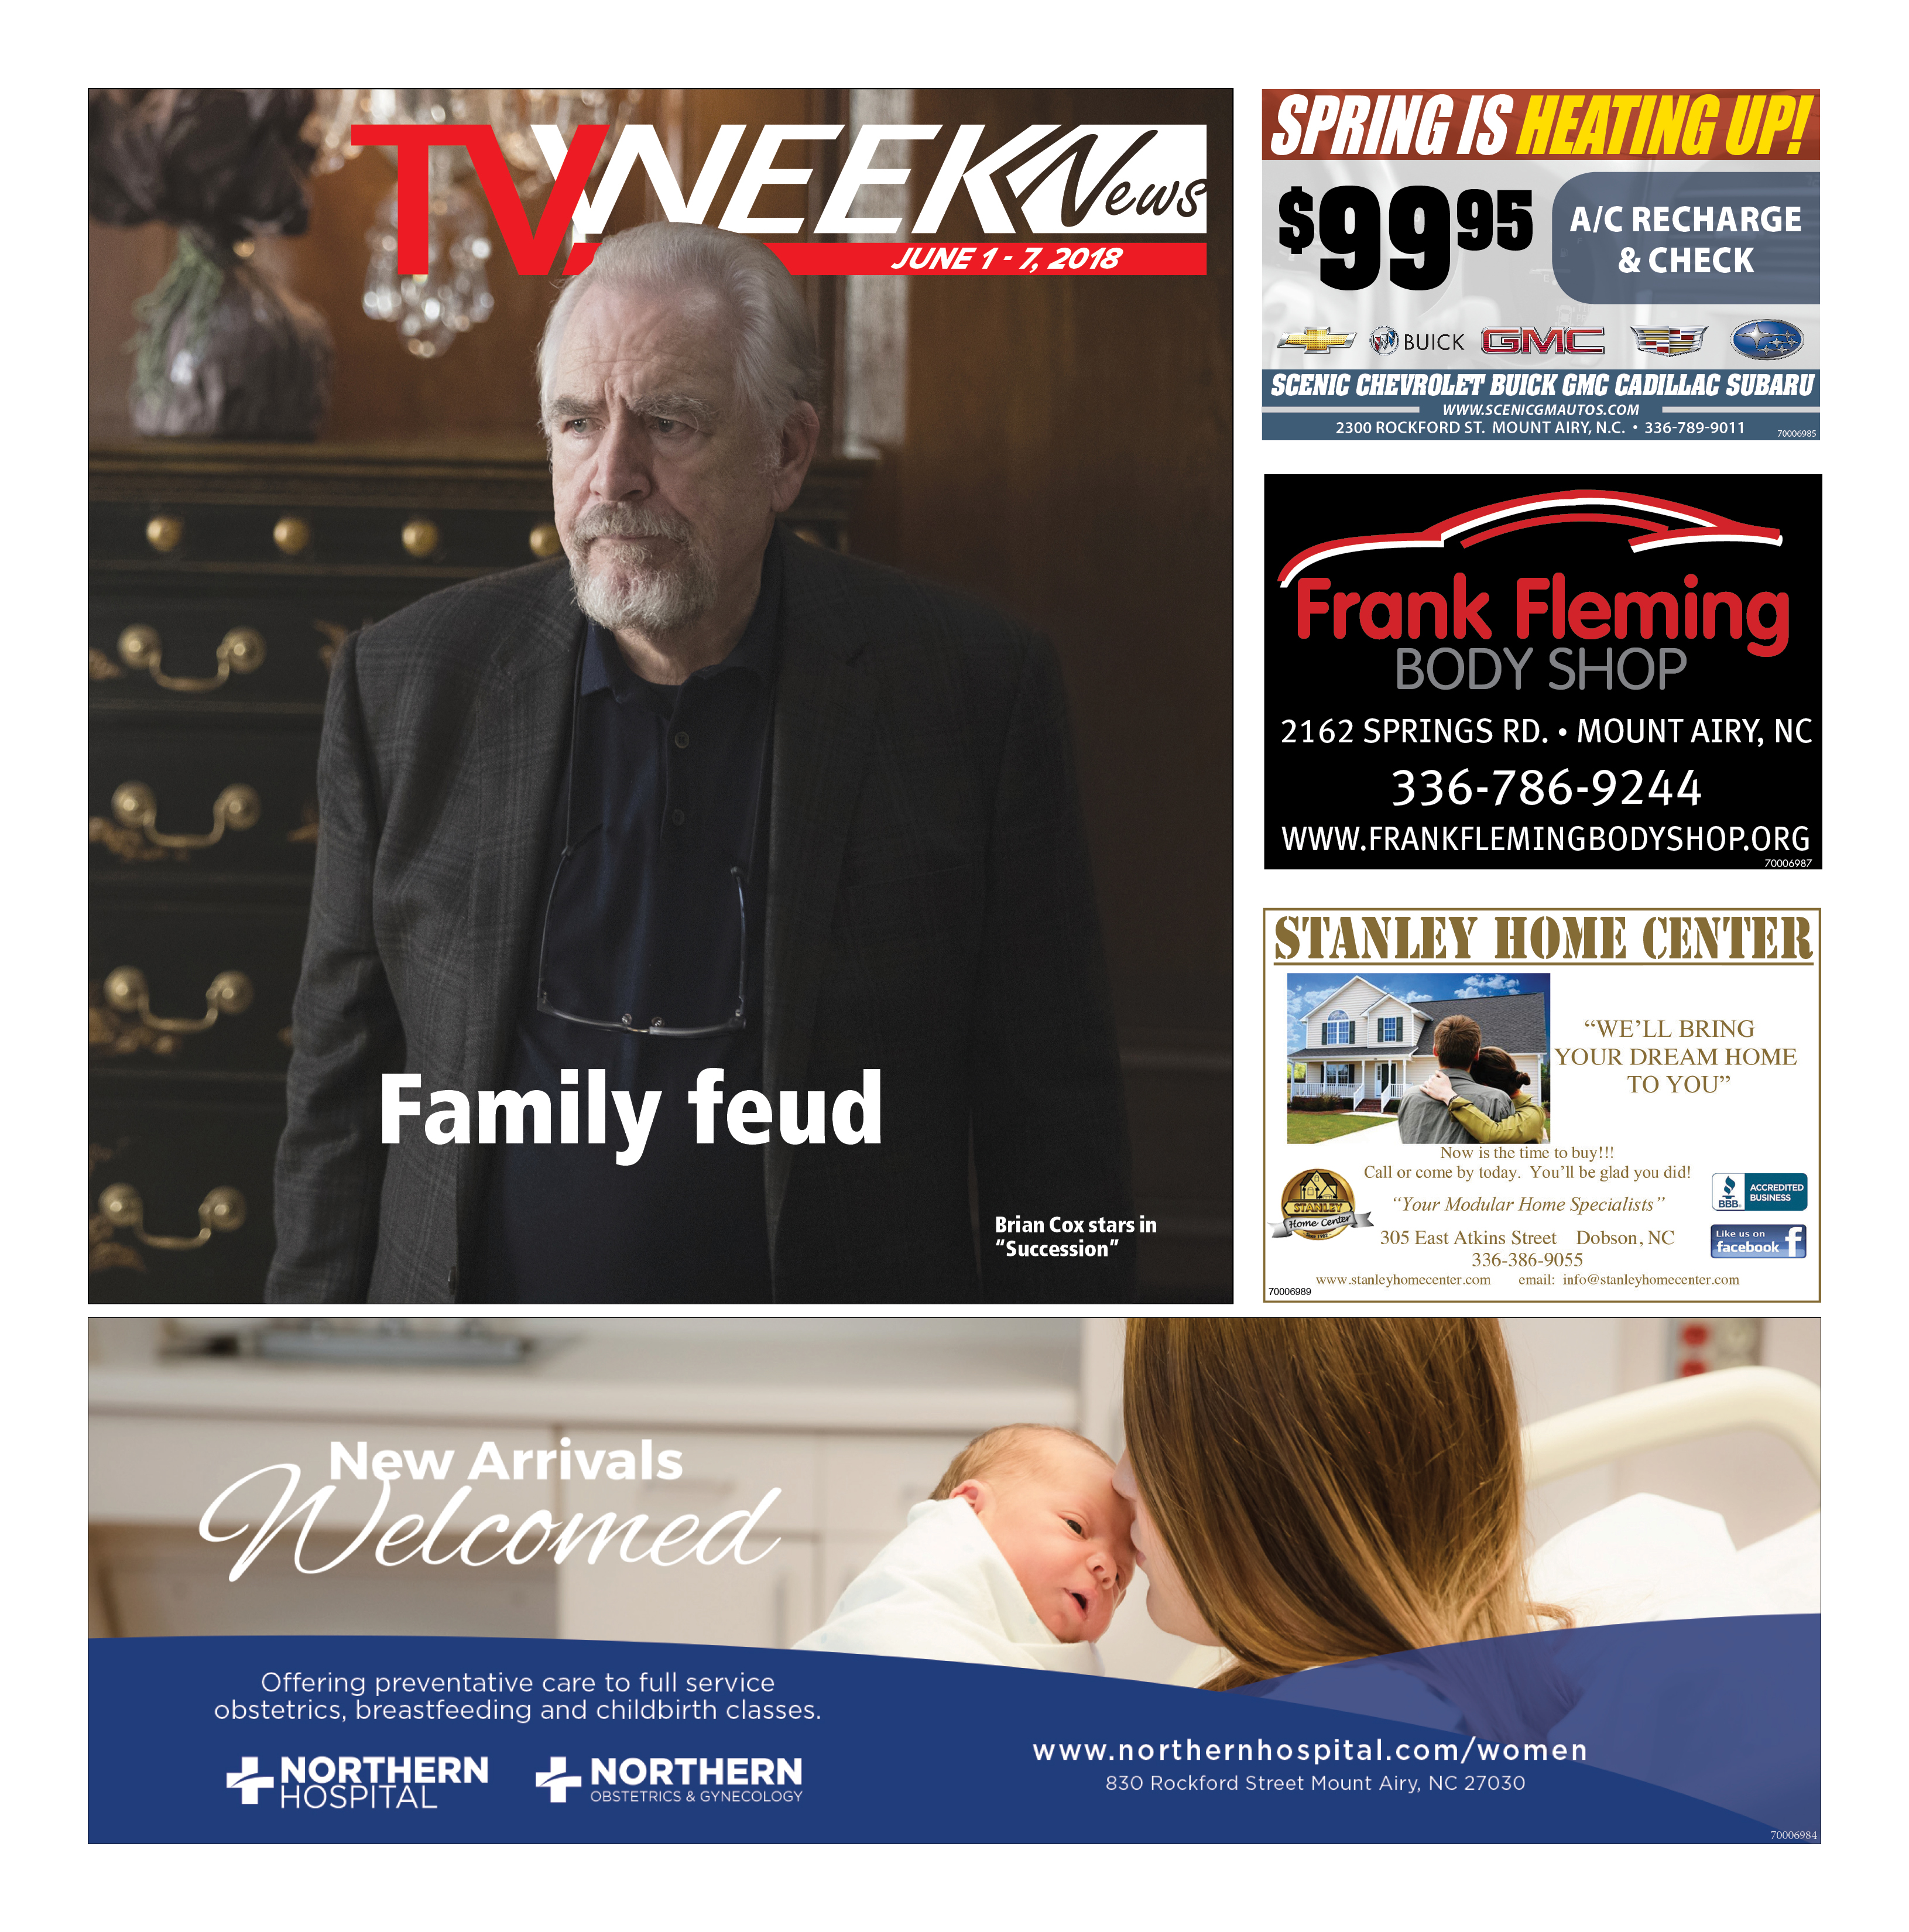 TV Week News June 1 – 7, 2018